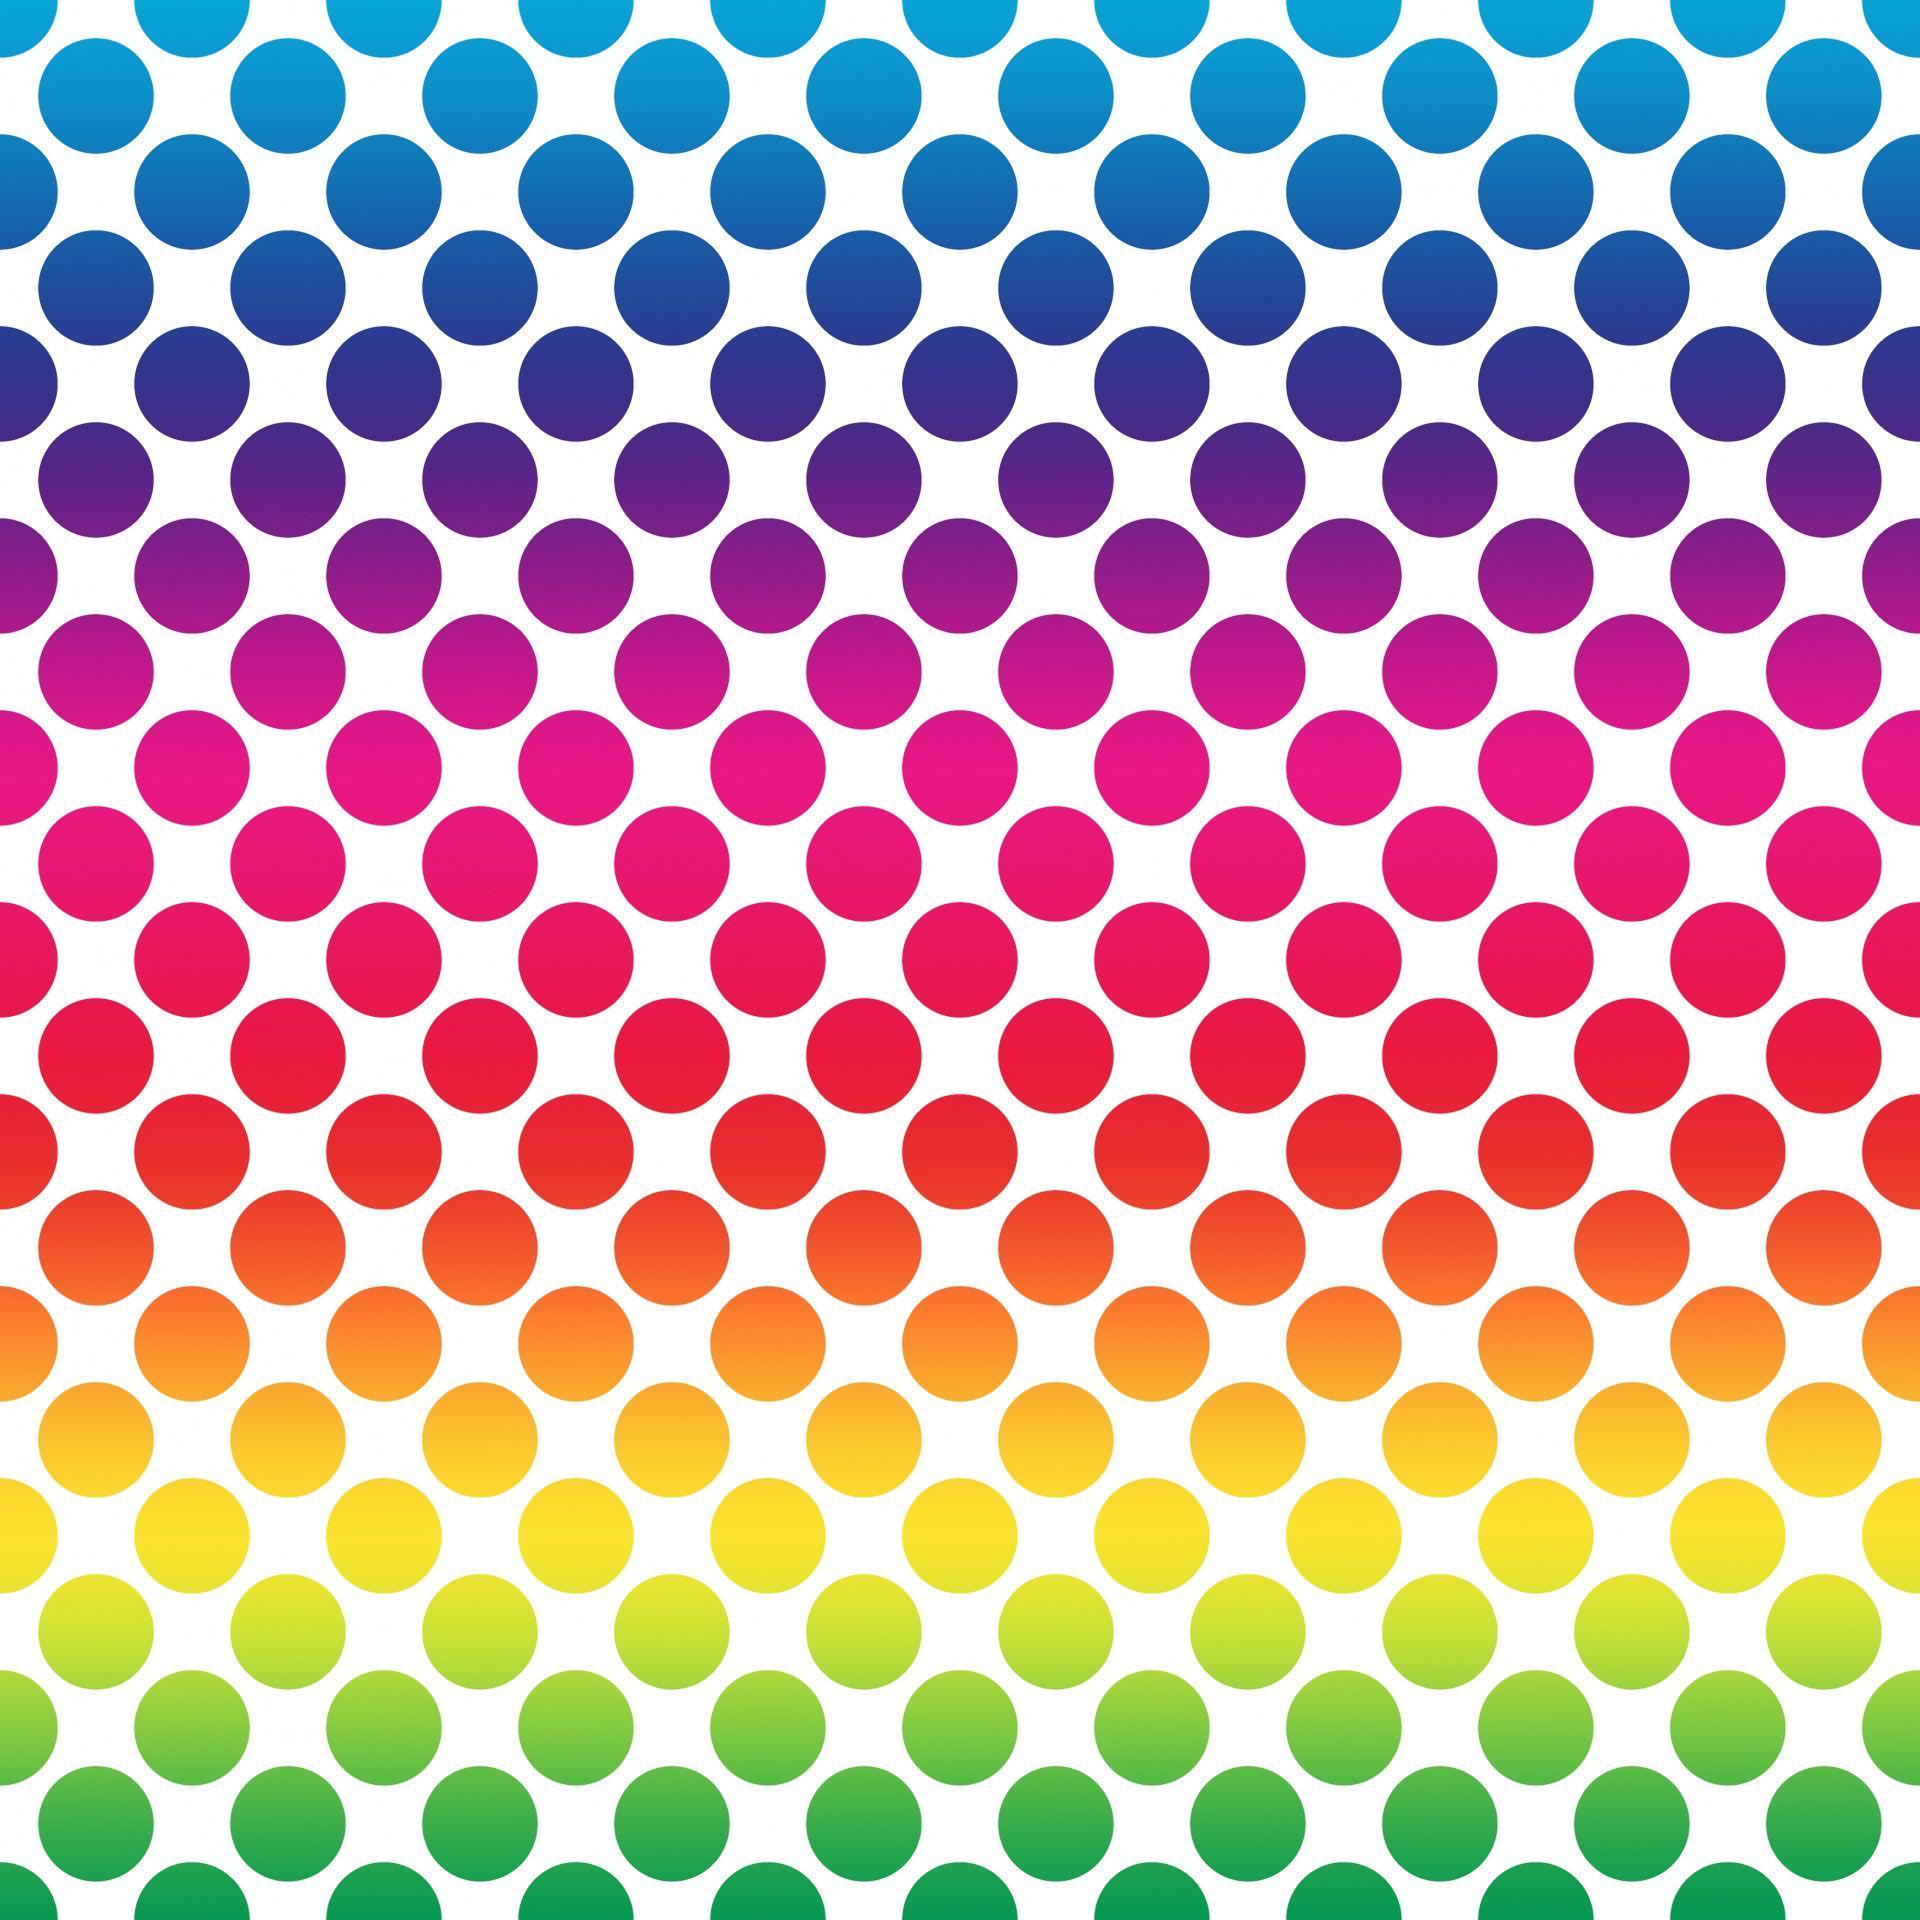 Polka Dot Phone Wallpapers - Top Free Polka Dot Phone ...